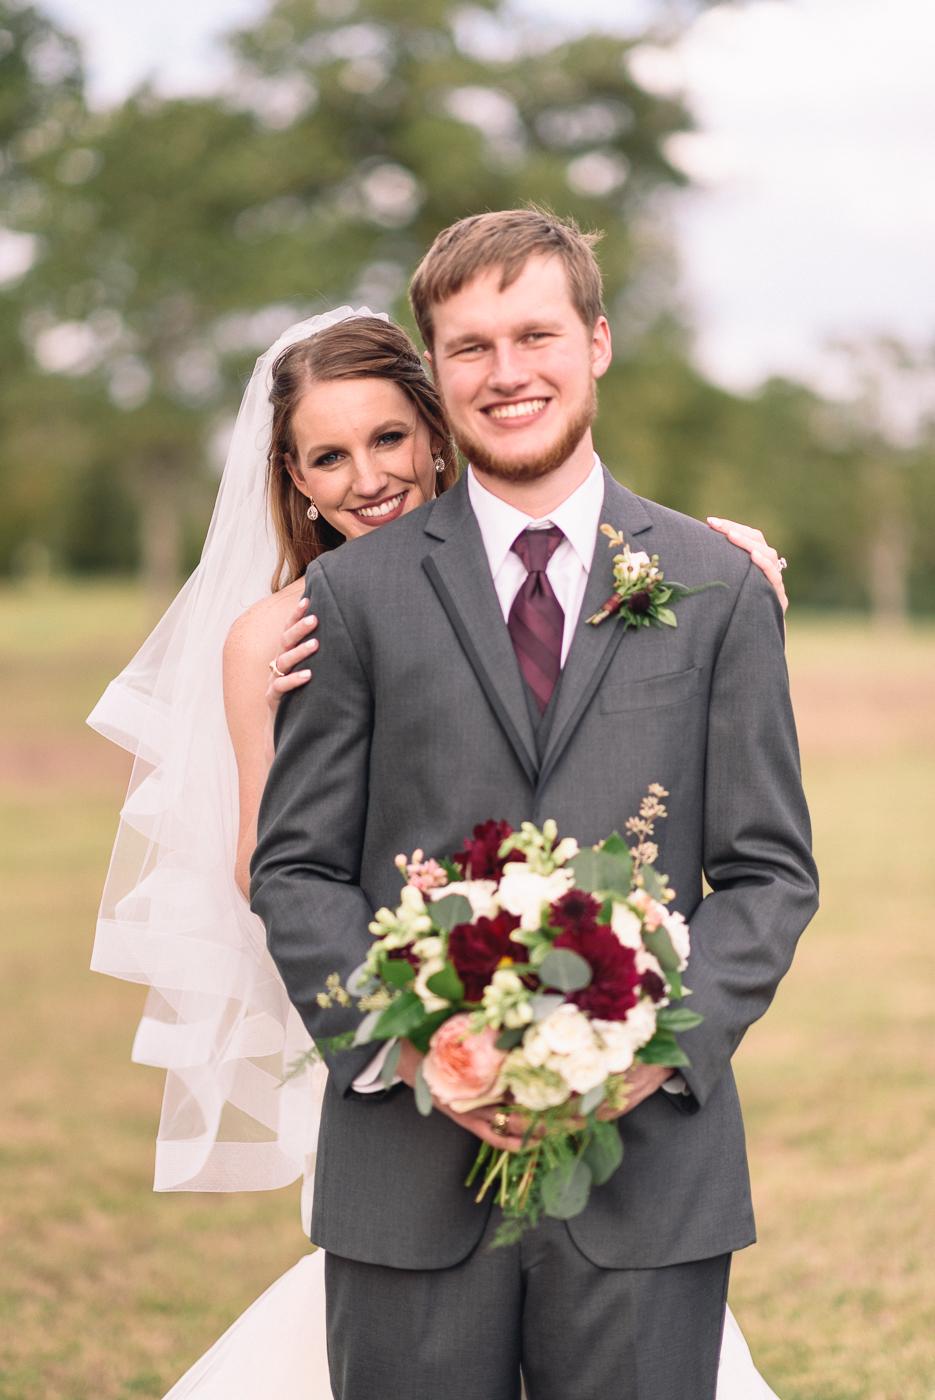 wedding portrait husband and wife maroon tie bouquet